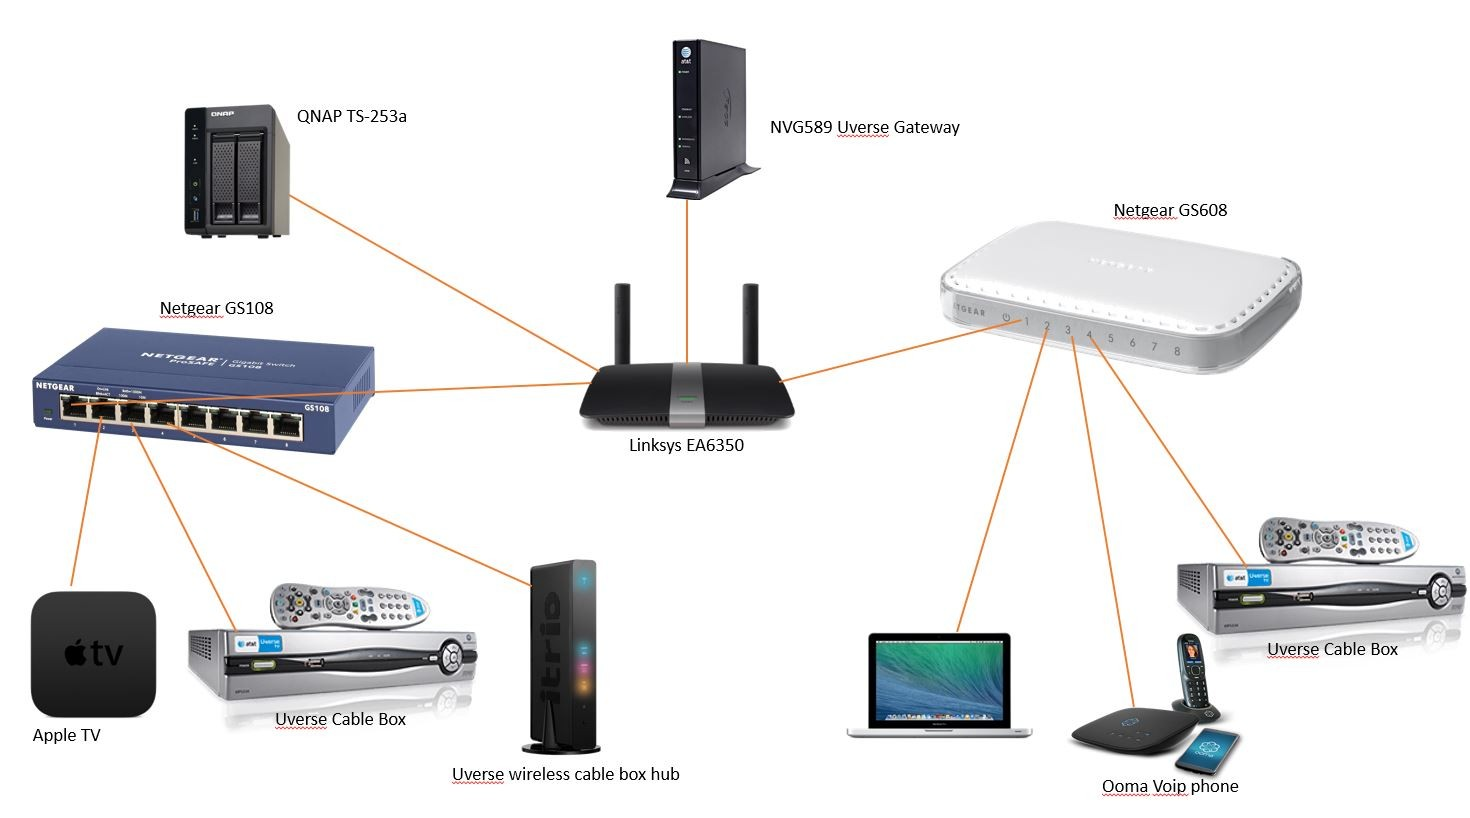 Nas Home Network Diagram Electrical Wiring Internet Car Fuse Box U2022 Rh Pokerchamps Co Basic Comcast